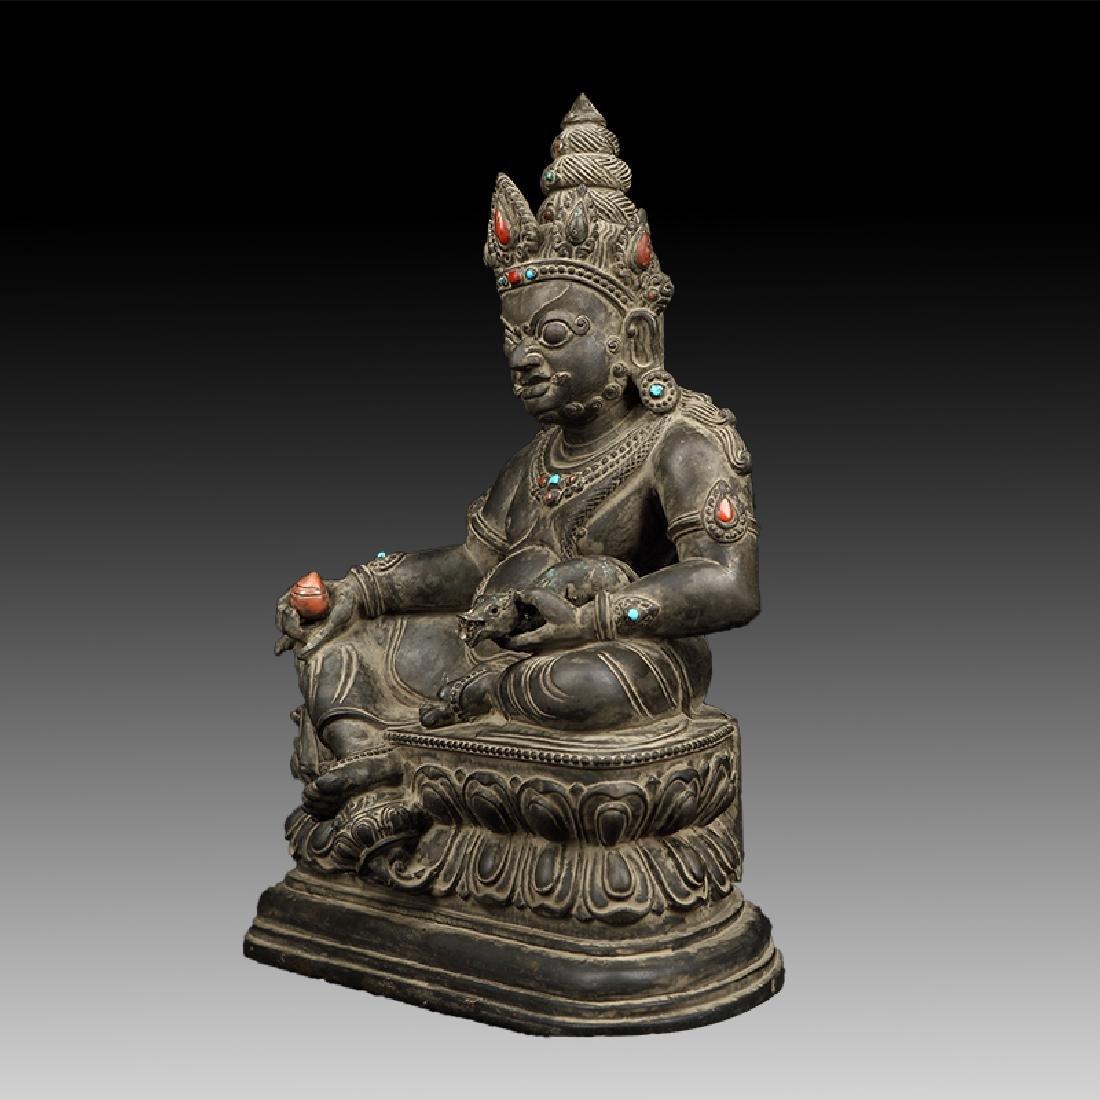 Chinese Antique Stone Buddha - 2